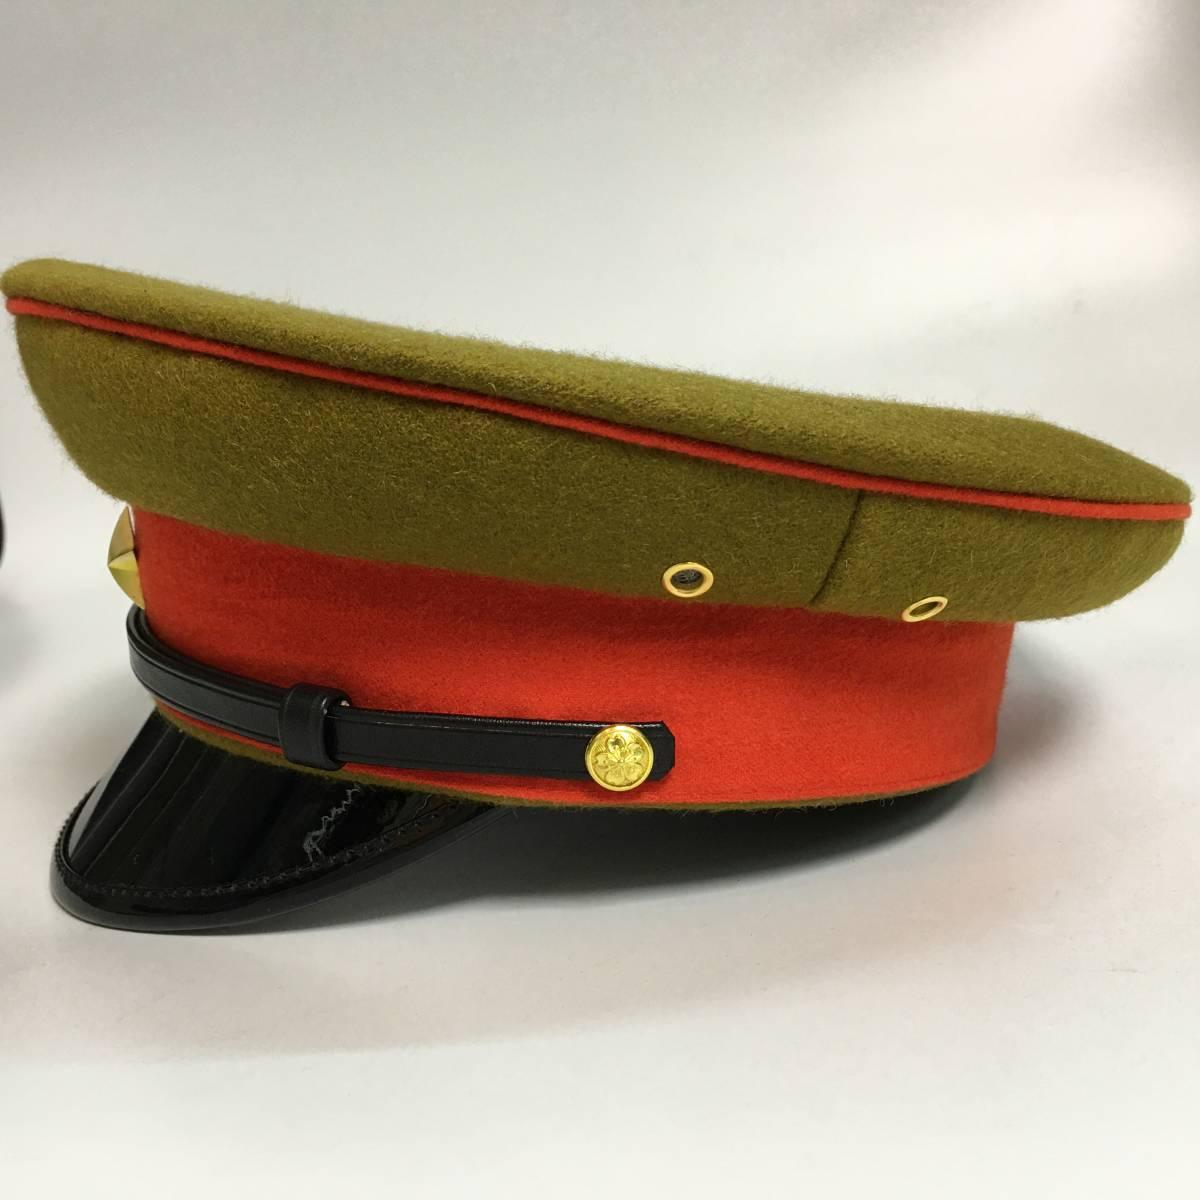 旧日本軍 陸軍将校用制帽 四五式軍帽 ウール製 57cm、58cm、59cm、60cm、61cm レプリカ_画像2